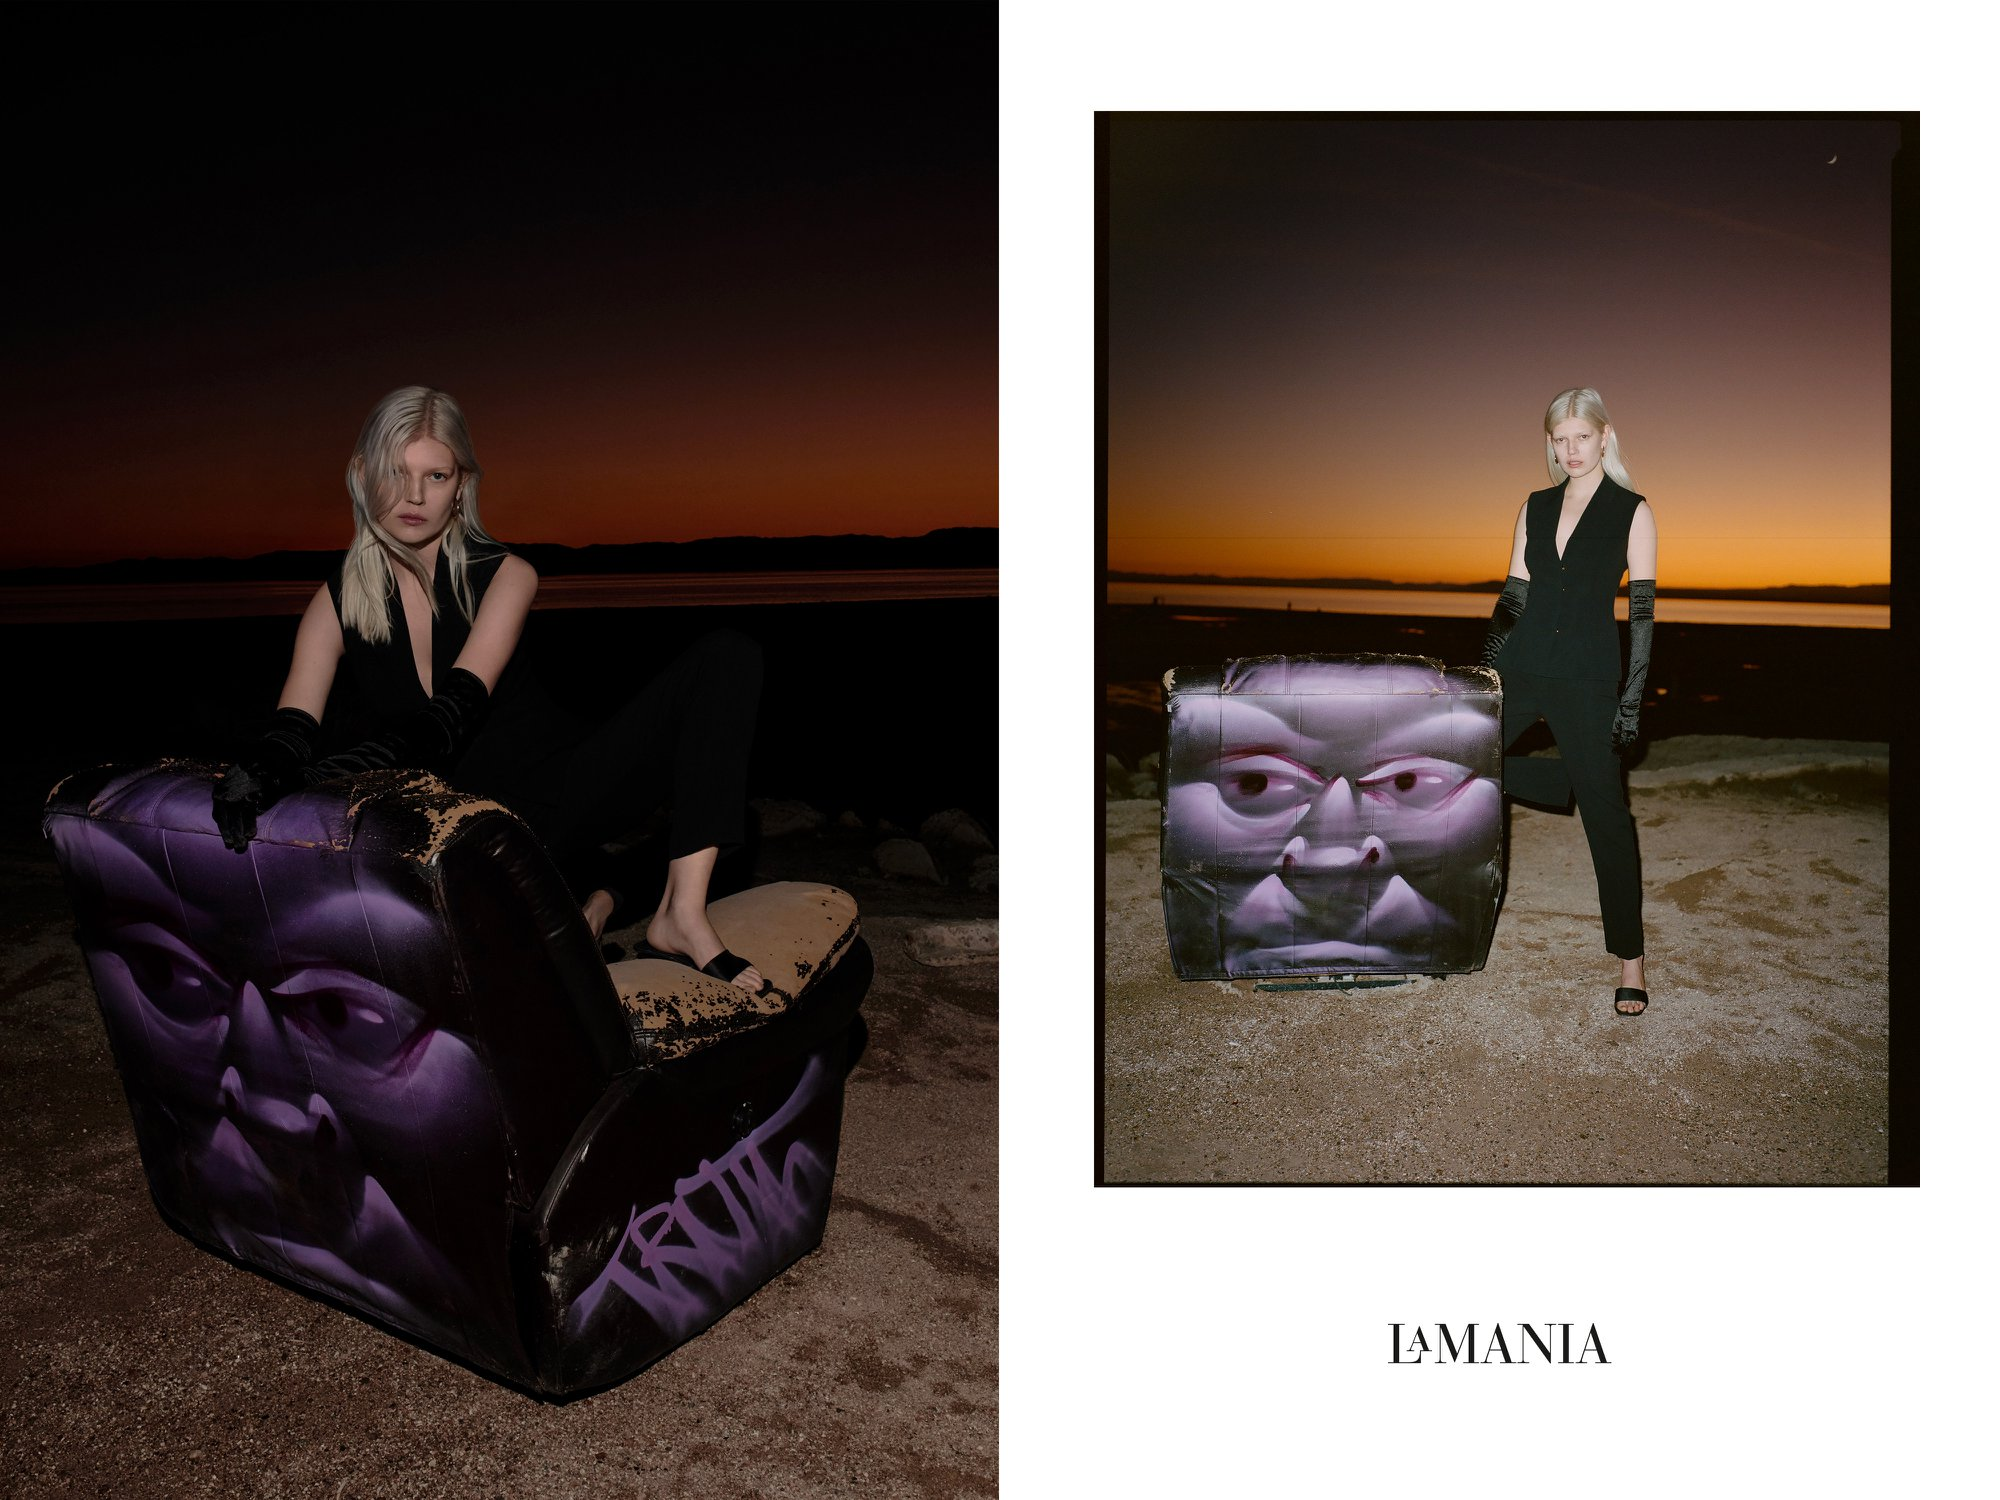 LaMania / SS20 Campaign